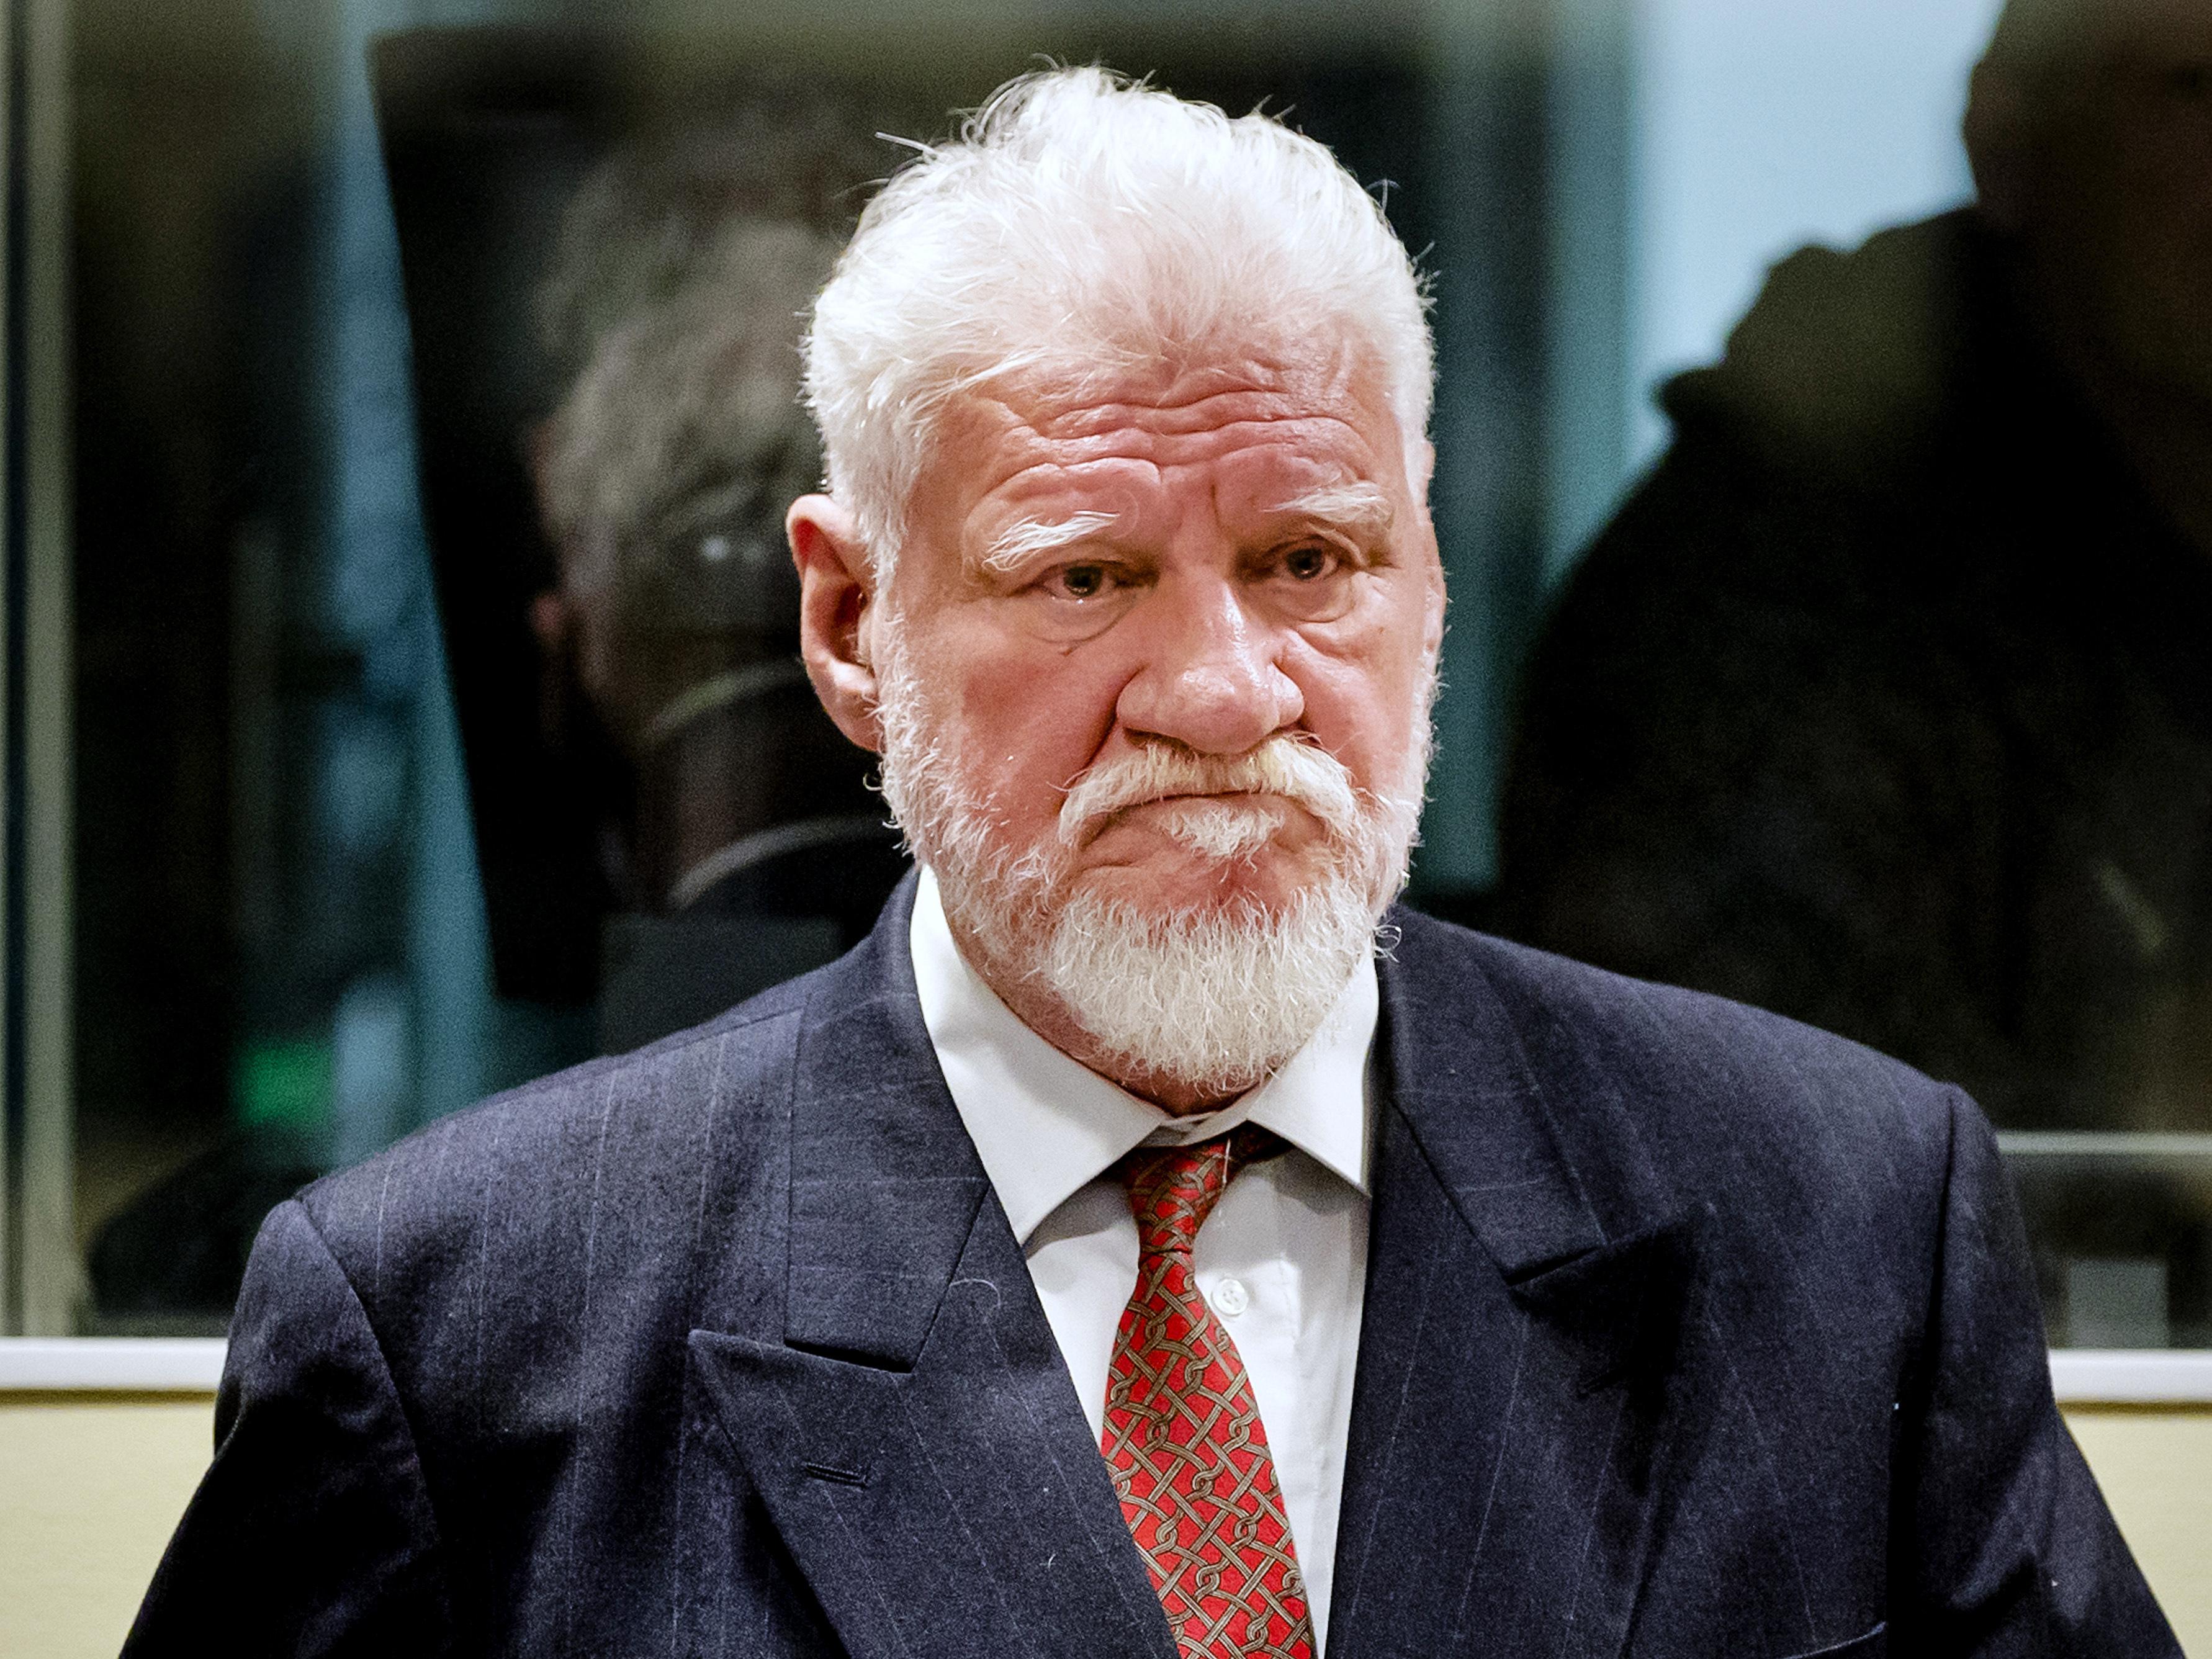 Drama at United Nations court as Slobodan Praljak 'takes poison'